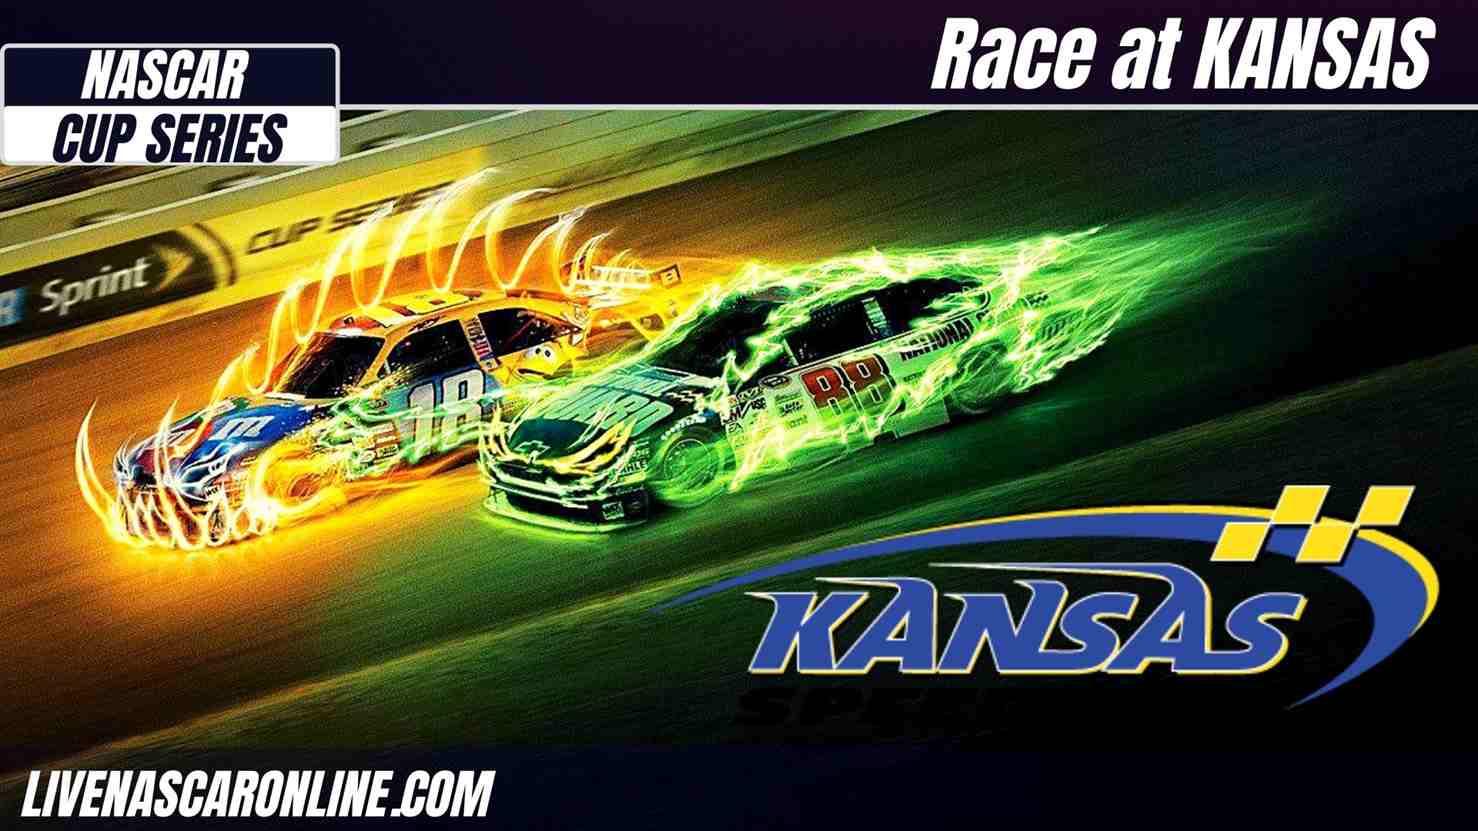 NASCAR Cup Race at Kansas Live Stream 2021